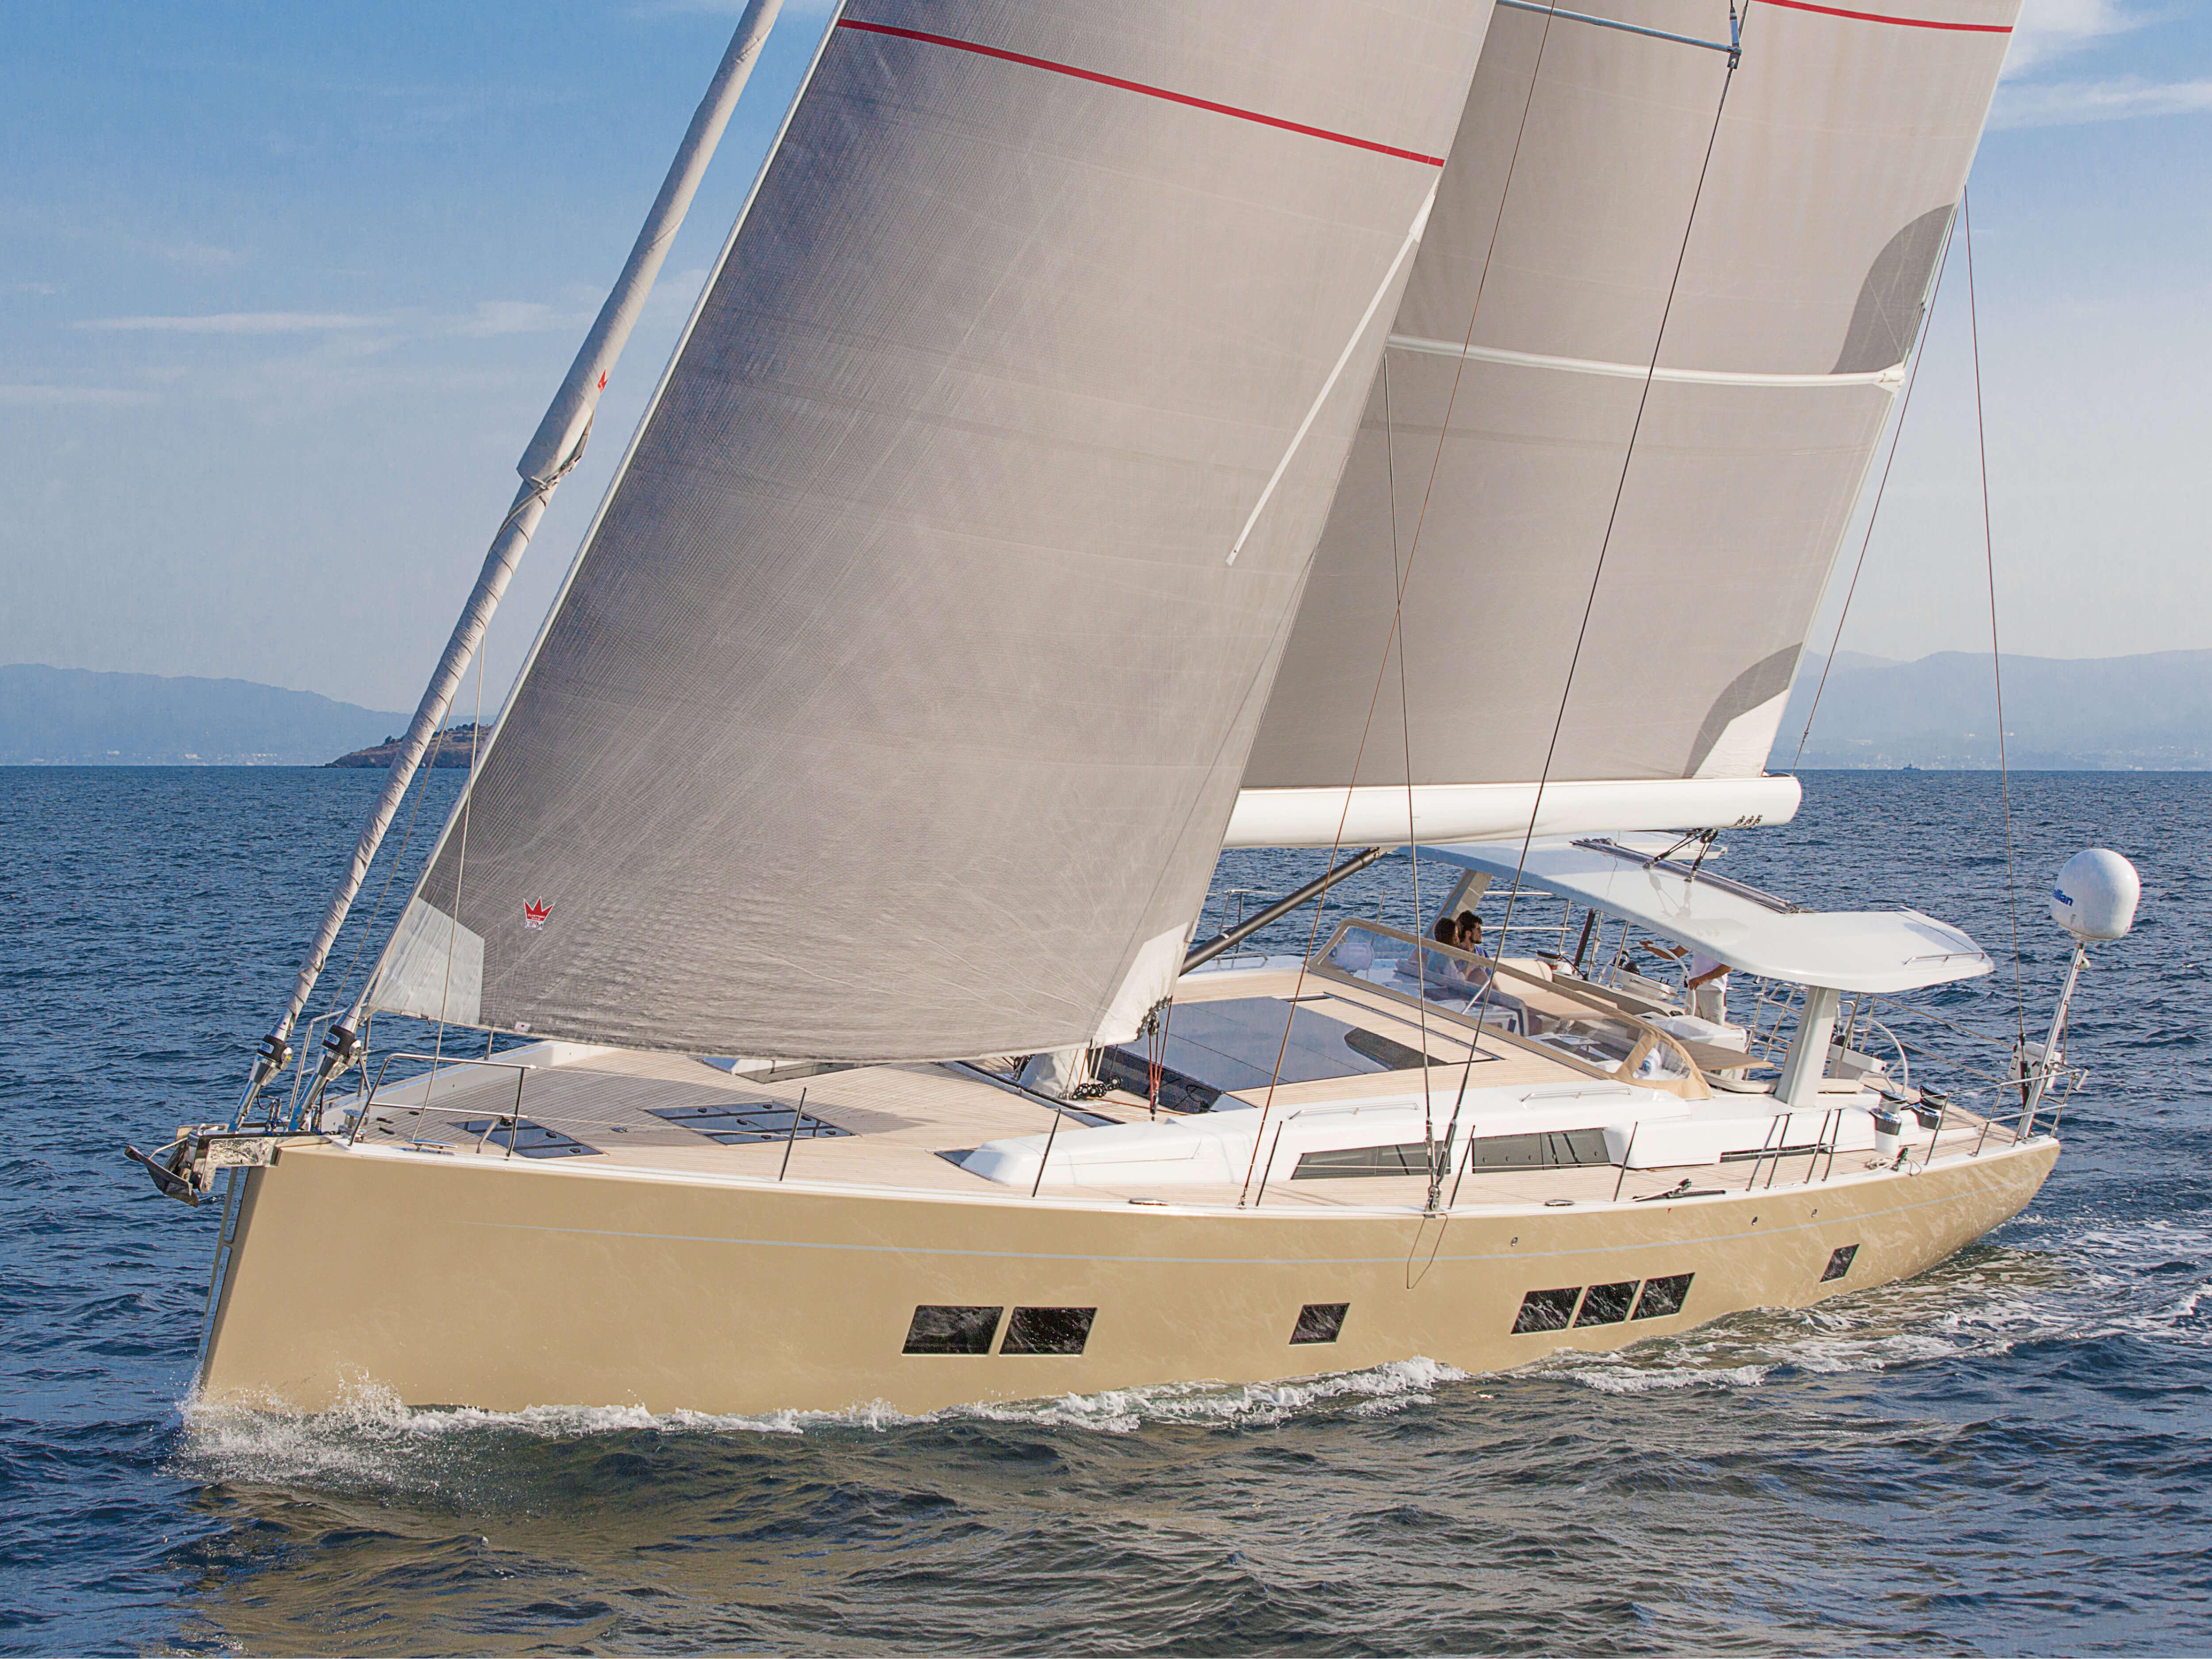 Hanse 675 | trinquete, vela mayor, barandilla, cubierta di teca | Hanse